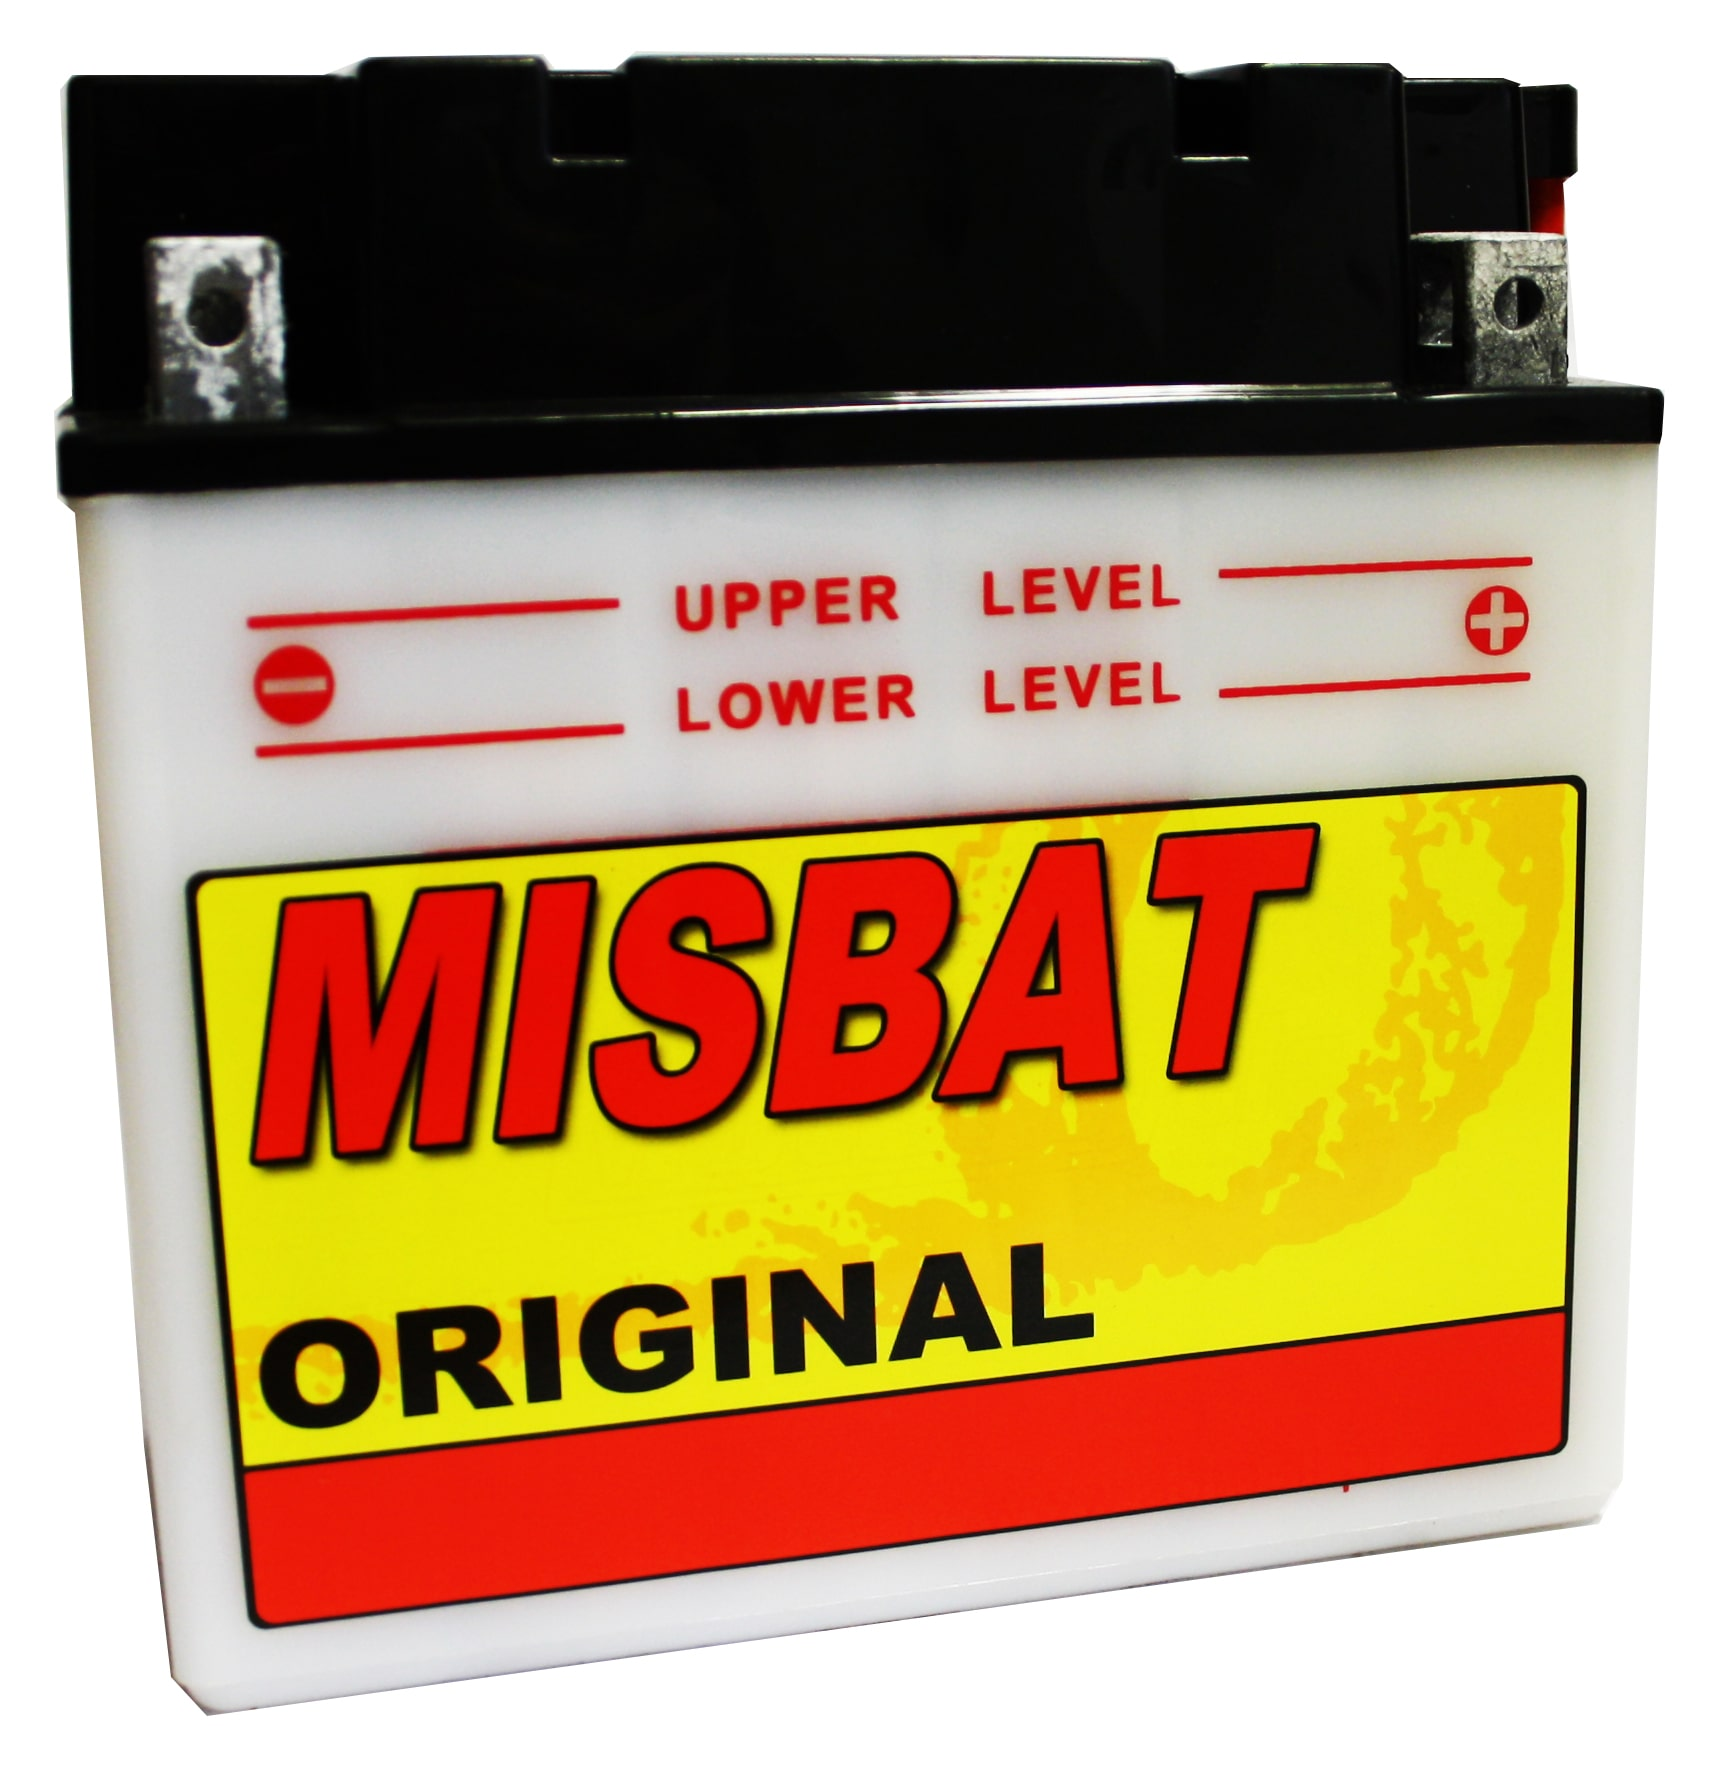 MISBAT MC 19 AH